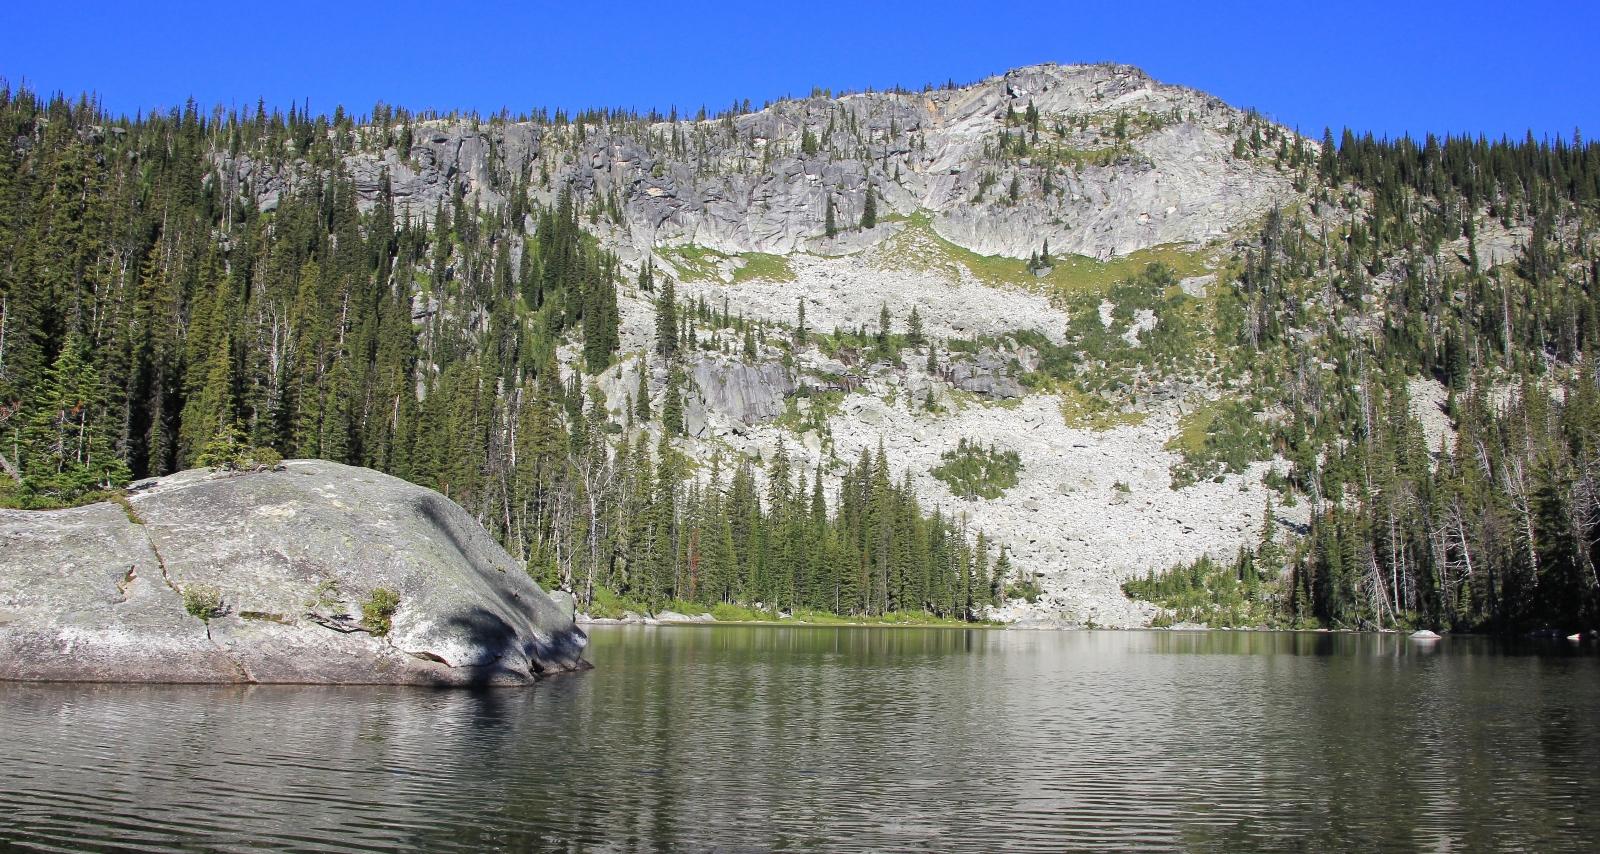 07-24-16-big-fisher-lake-bp-63-copy